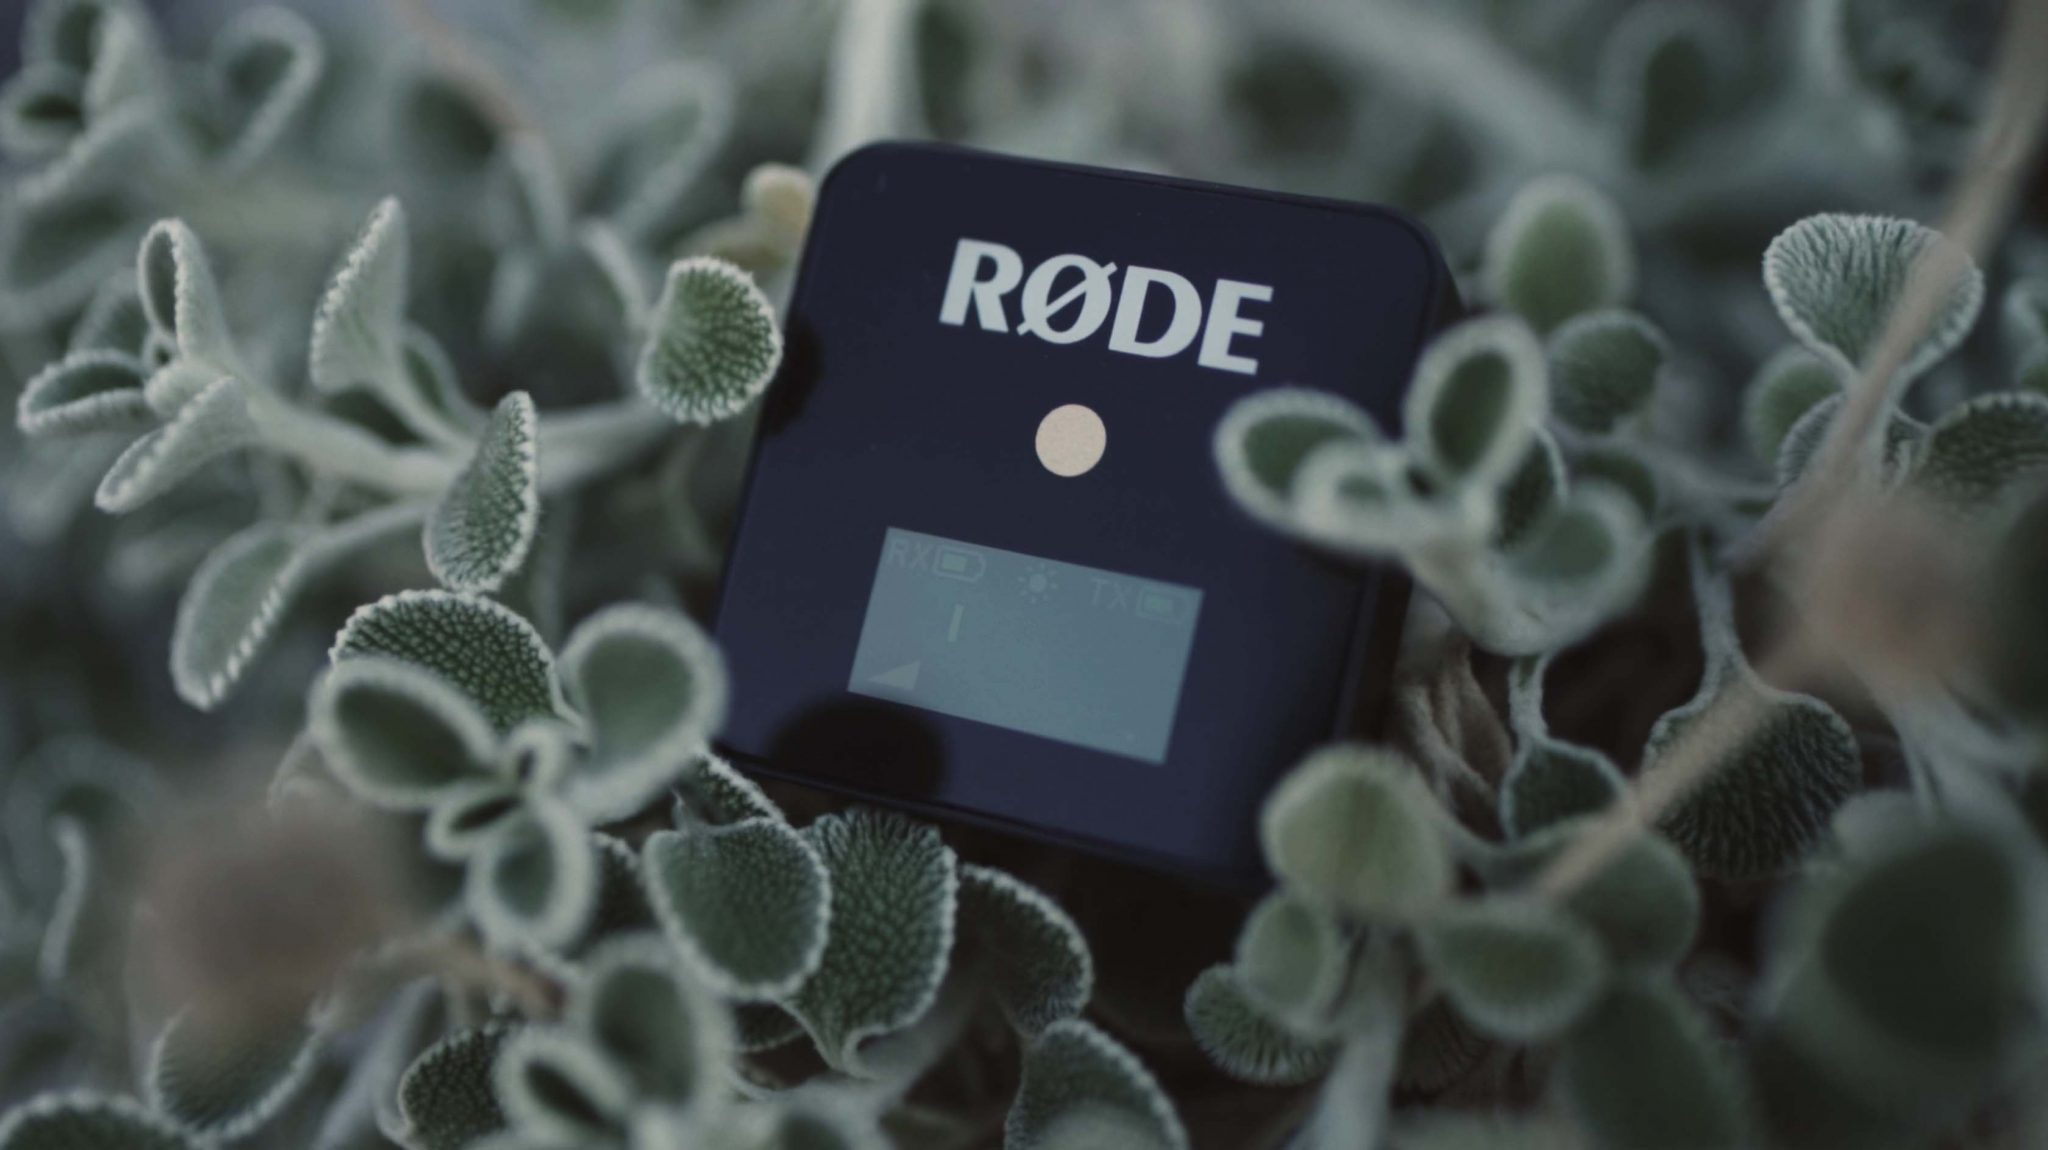 Rode Wireless GO | AOV Gear Highlights